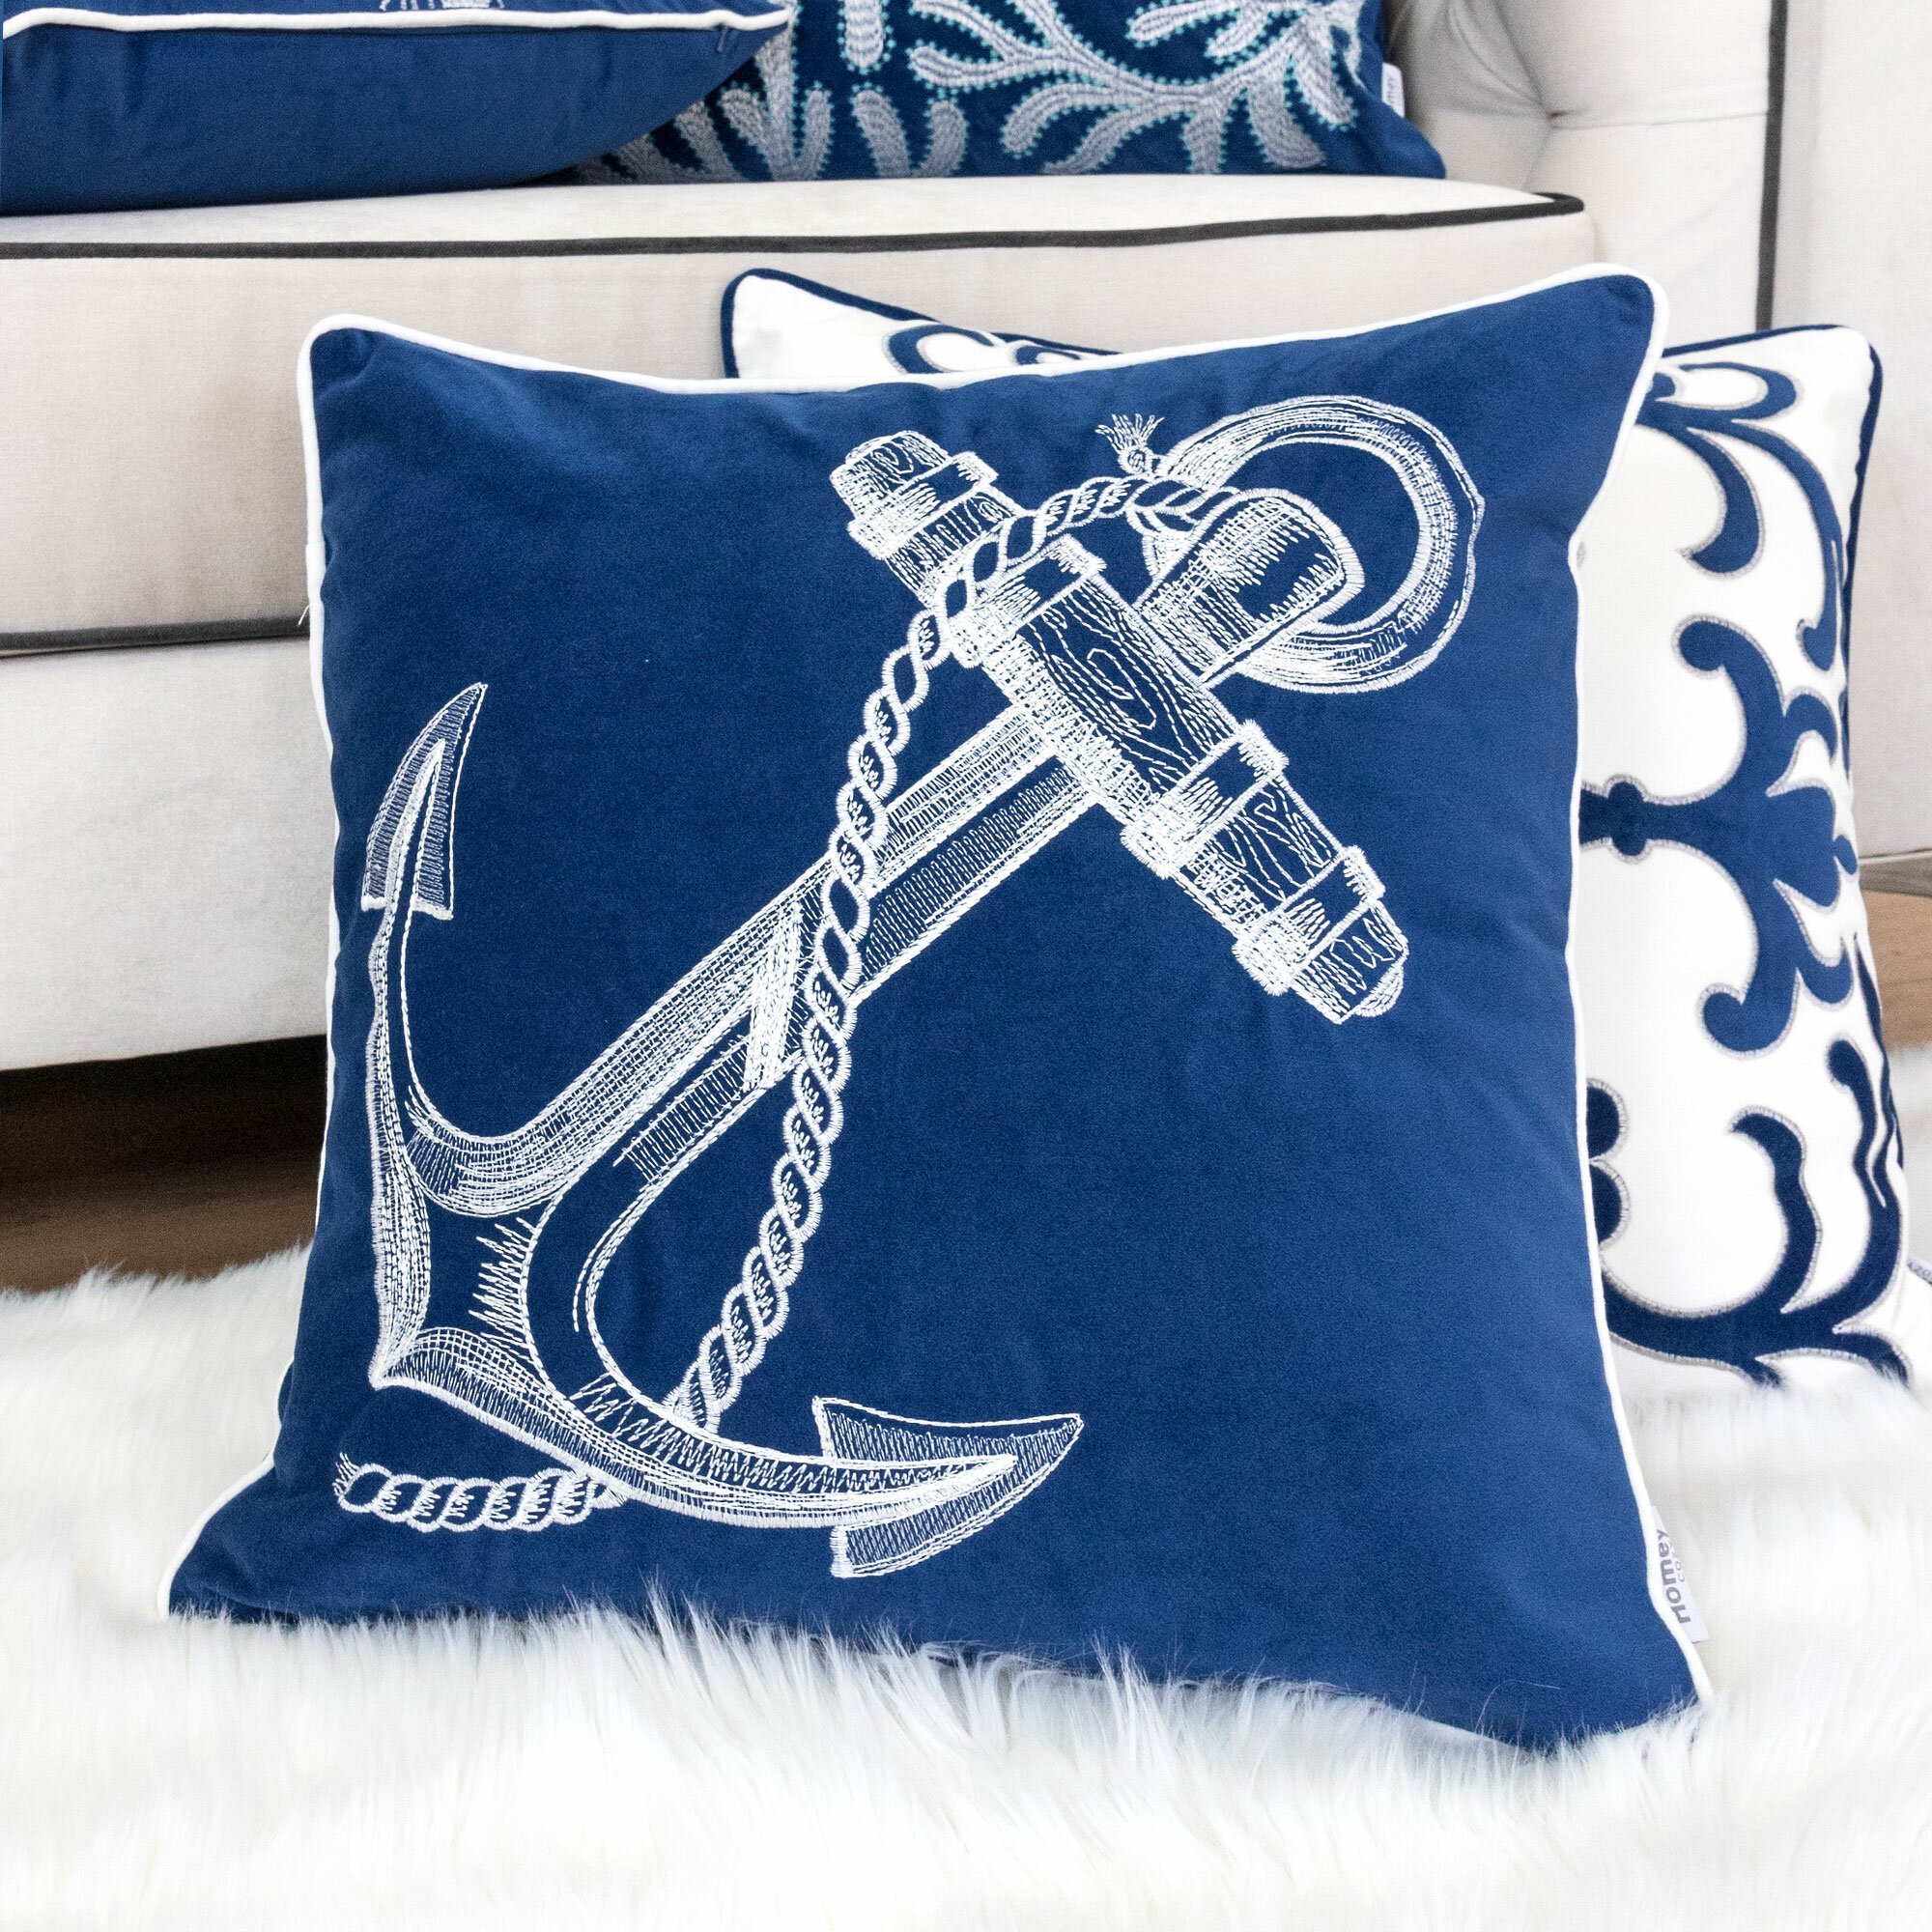 Longshore Tides Canas Embroidery Anchor Indoor Outdoor Throw Pillow Reviews Wayfair